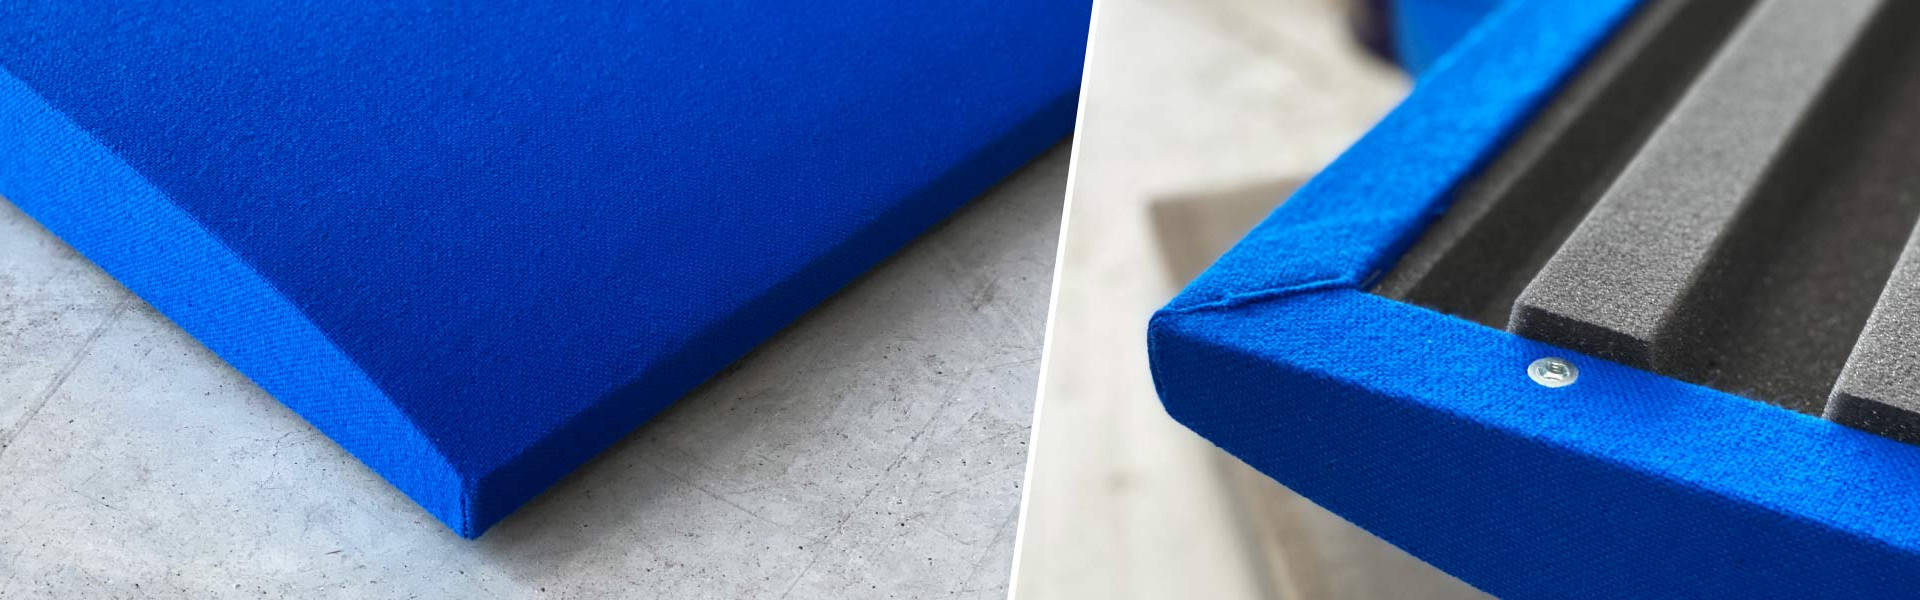 artnovion-product-andrea-absorber-92f5b0